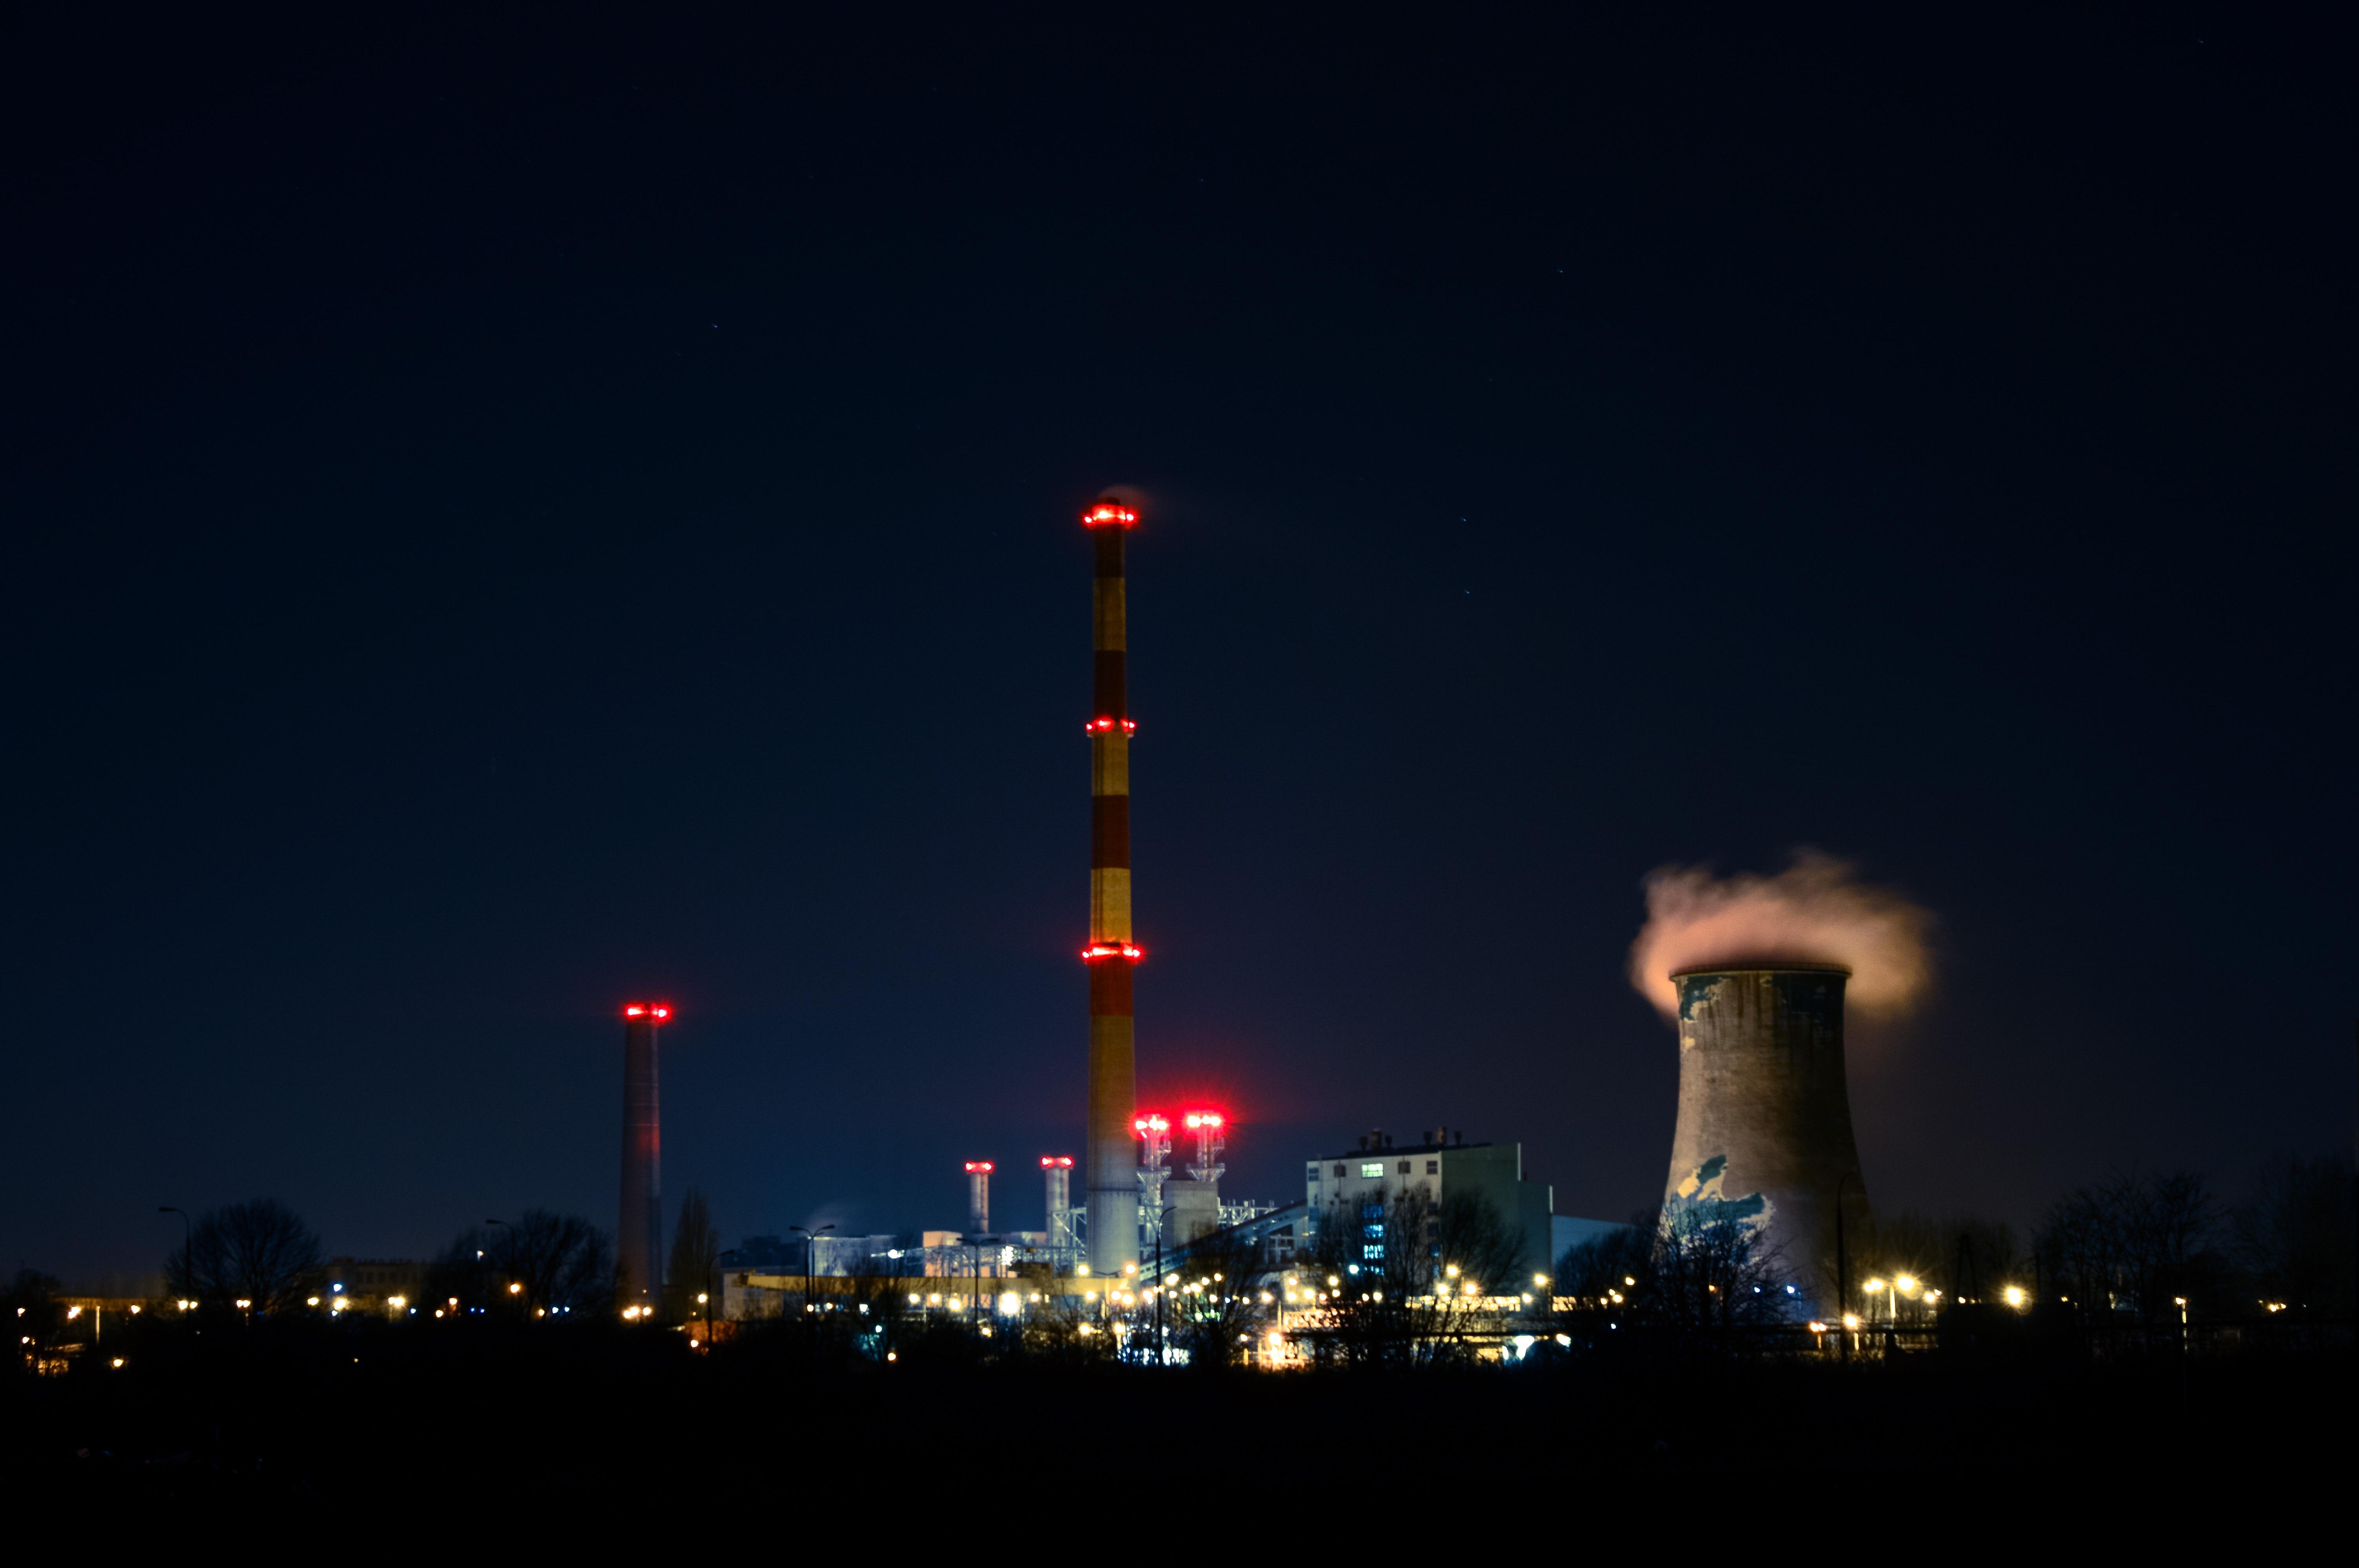 Norbert Biedrzycki bomb ticking Chernobyl Prypec